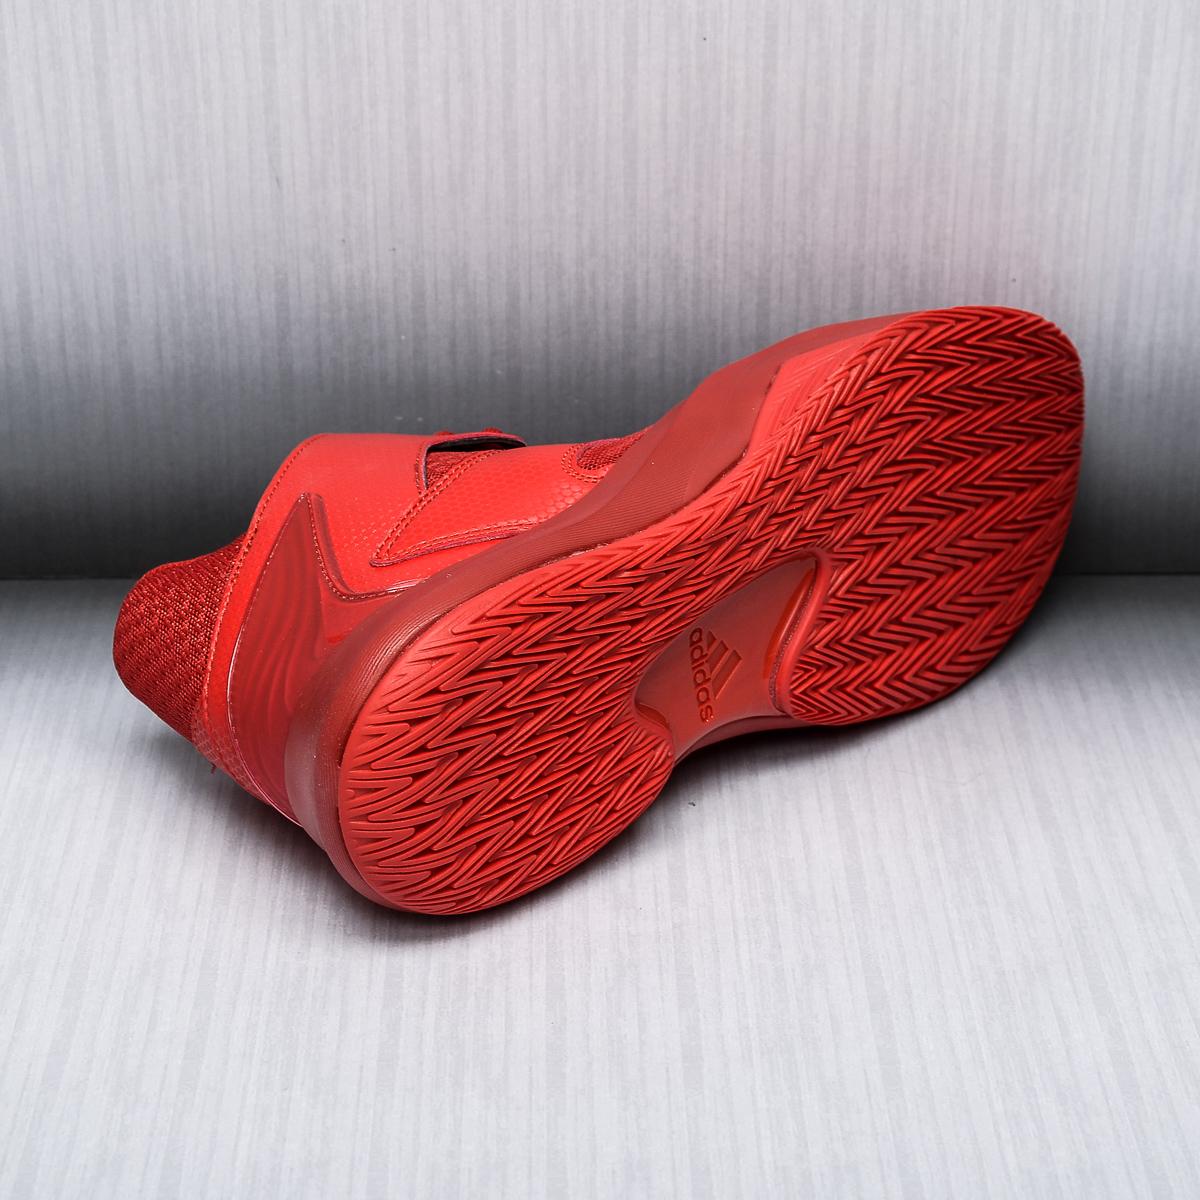 Adidas Subió 773 Zapatillas De Baloncesto qmGJa9B